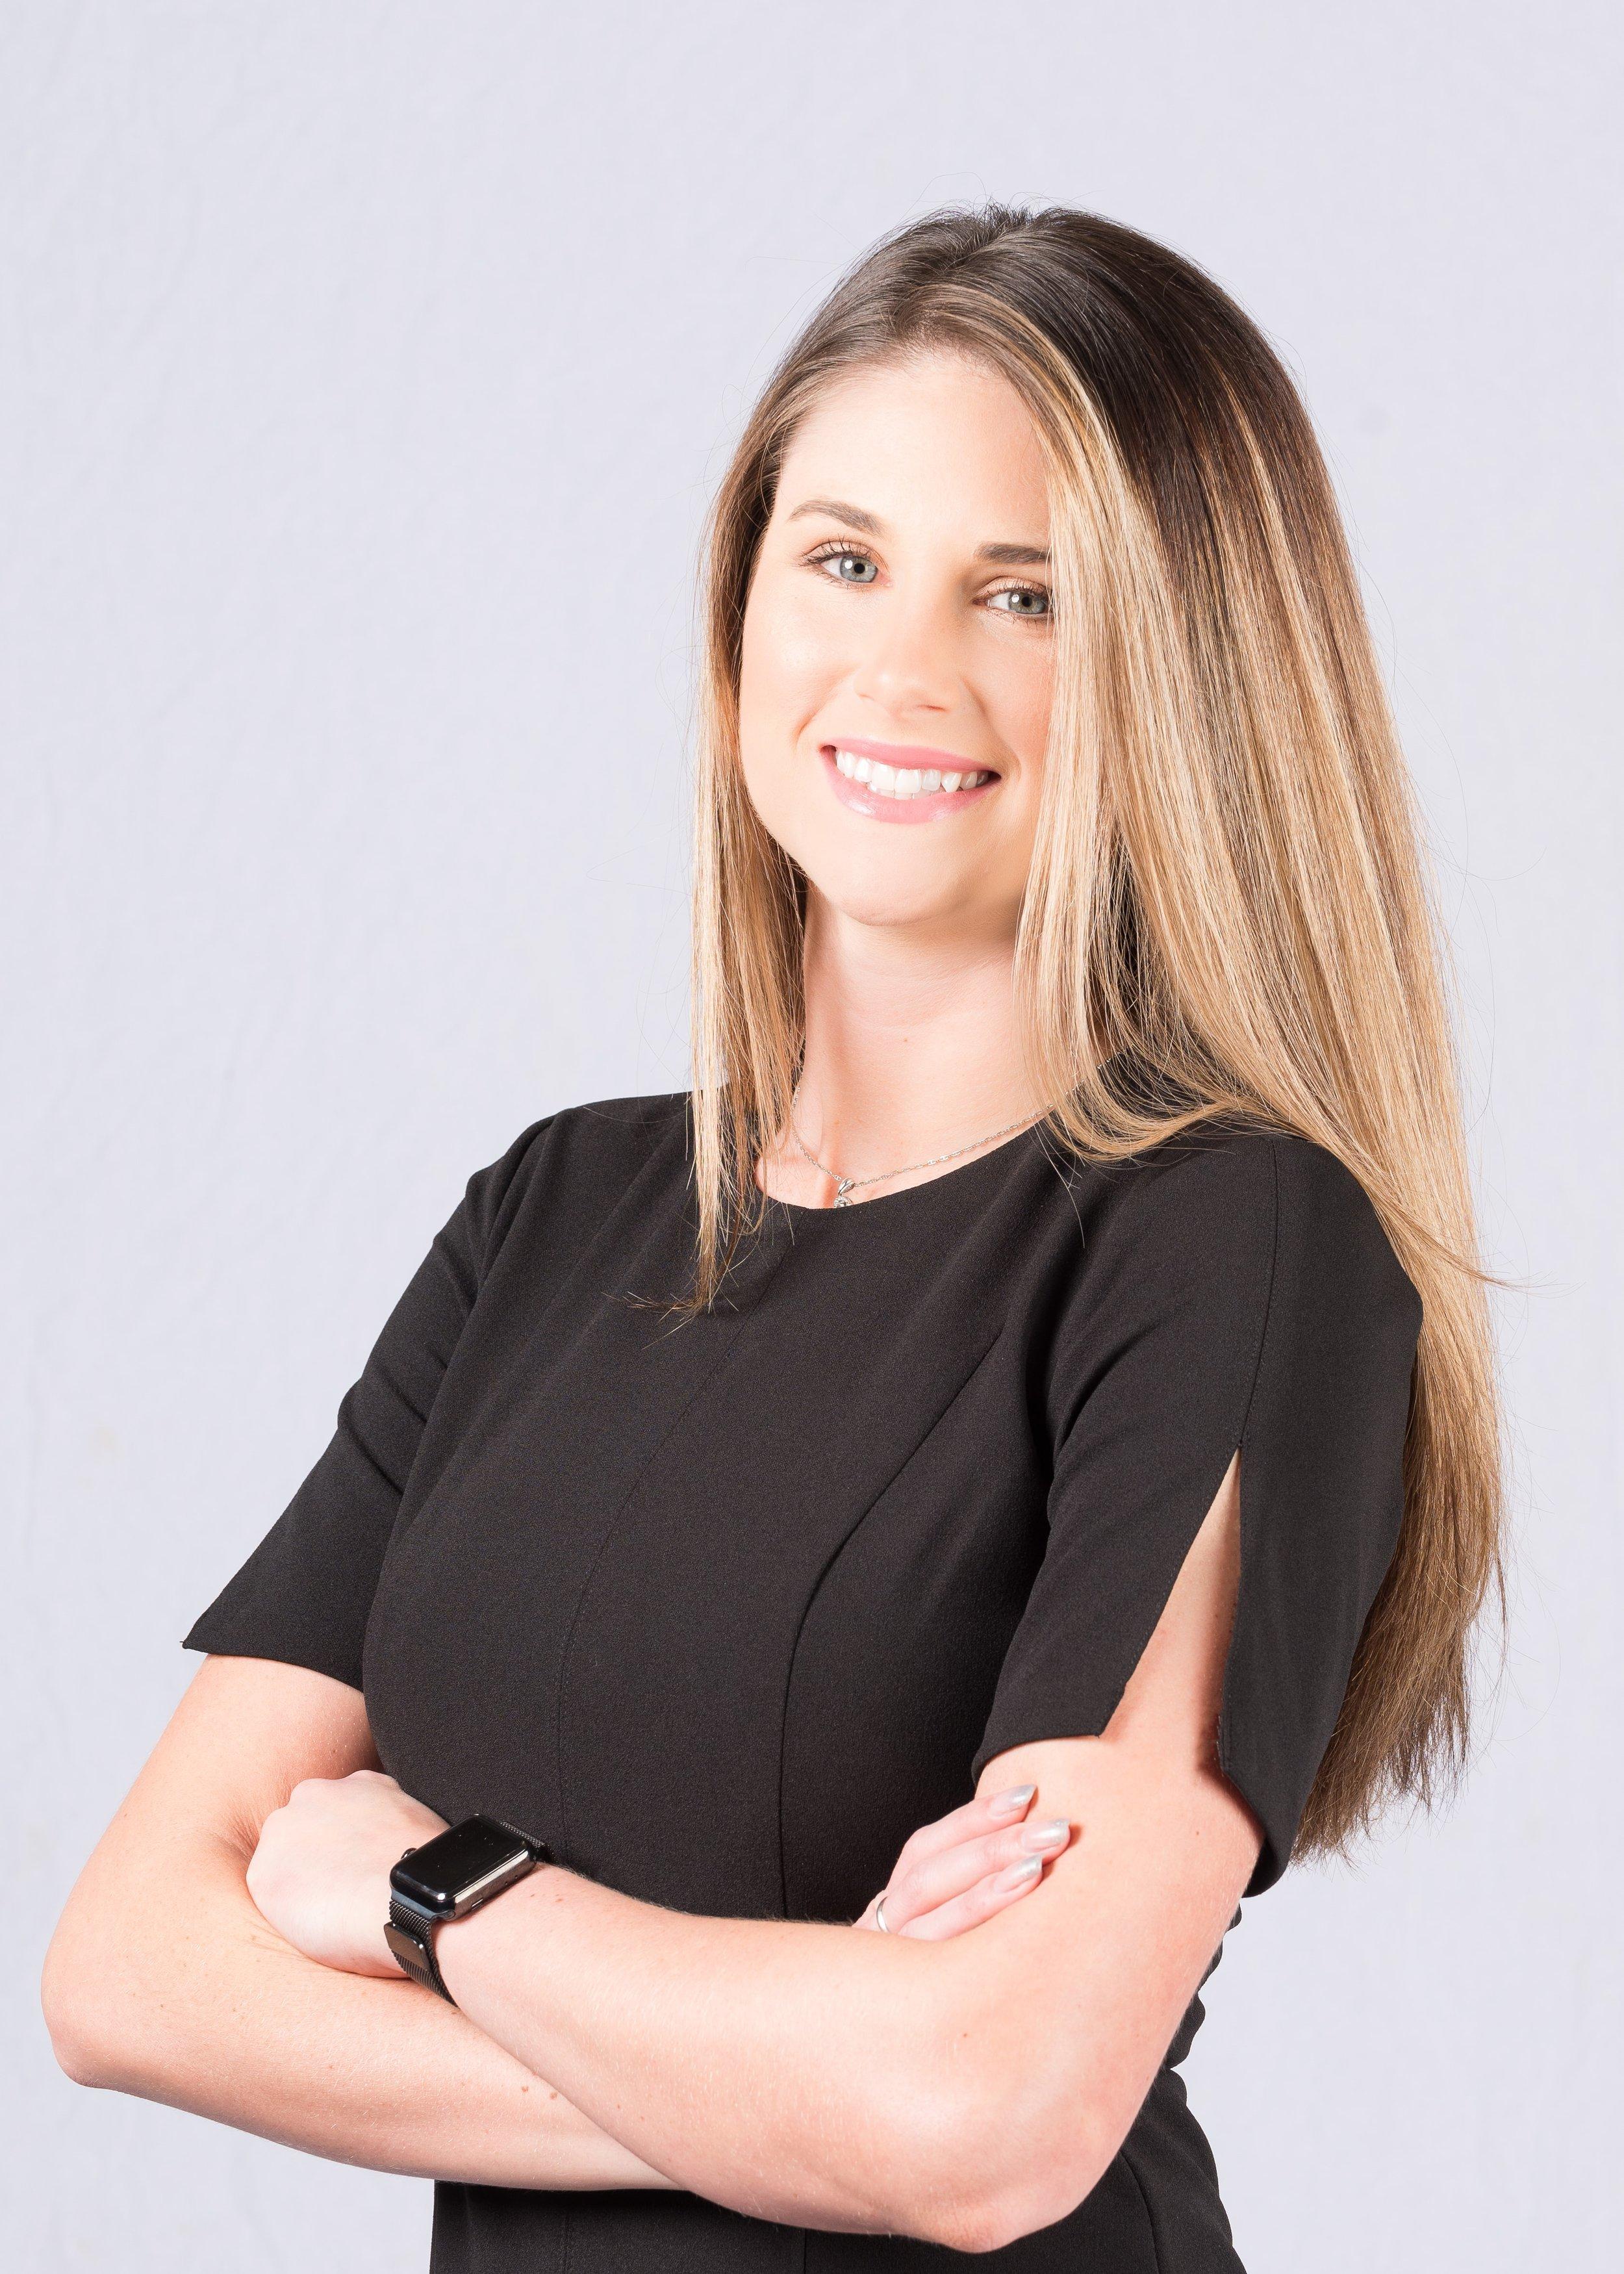 Kristen - professional headshot 0506.jpg